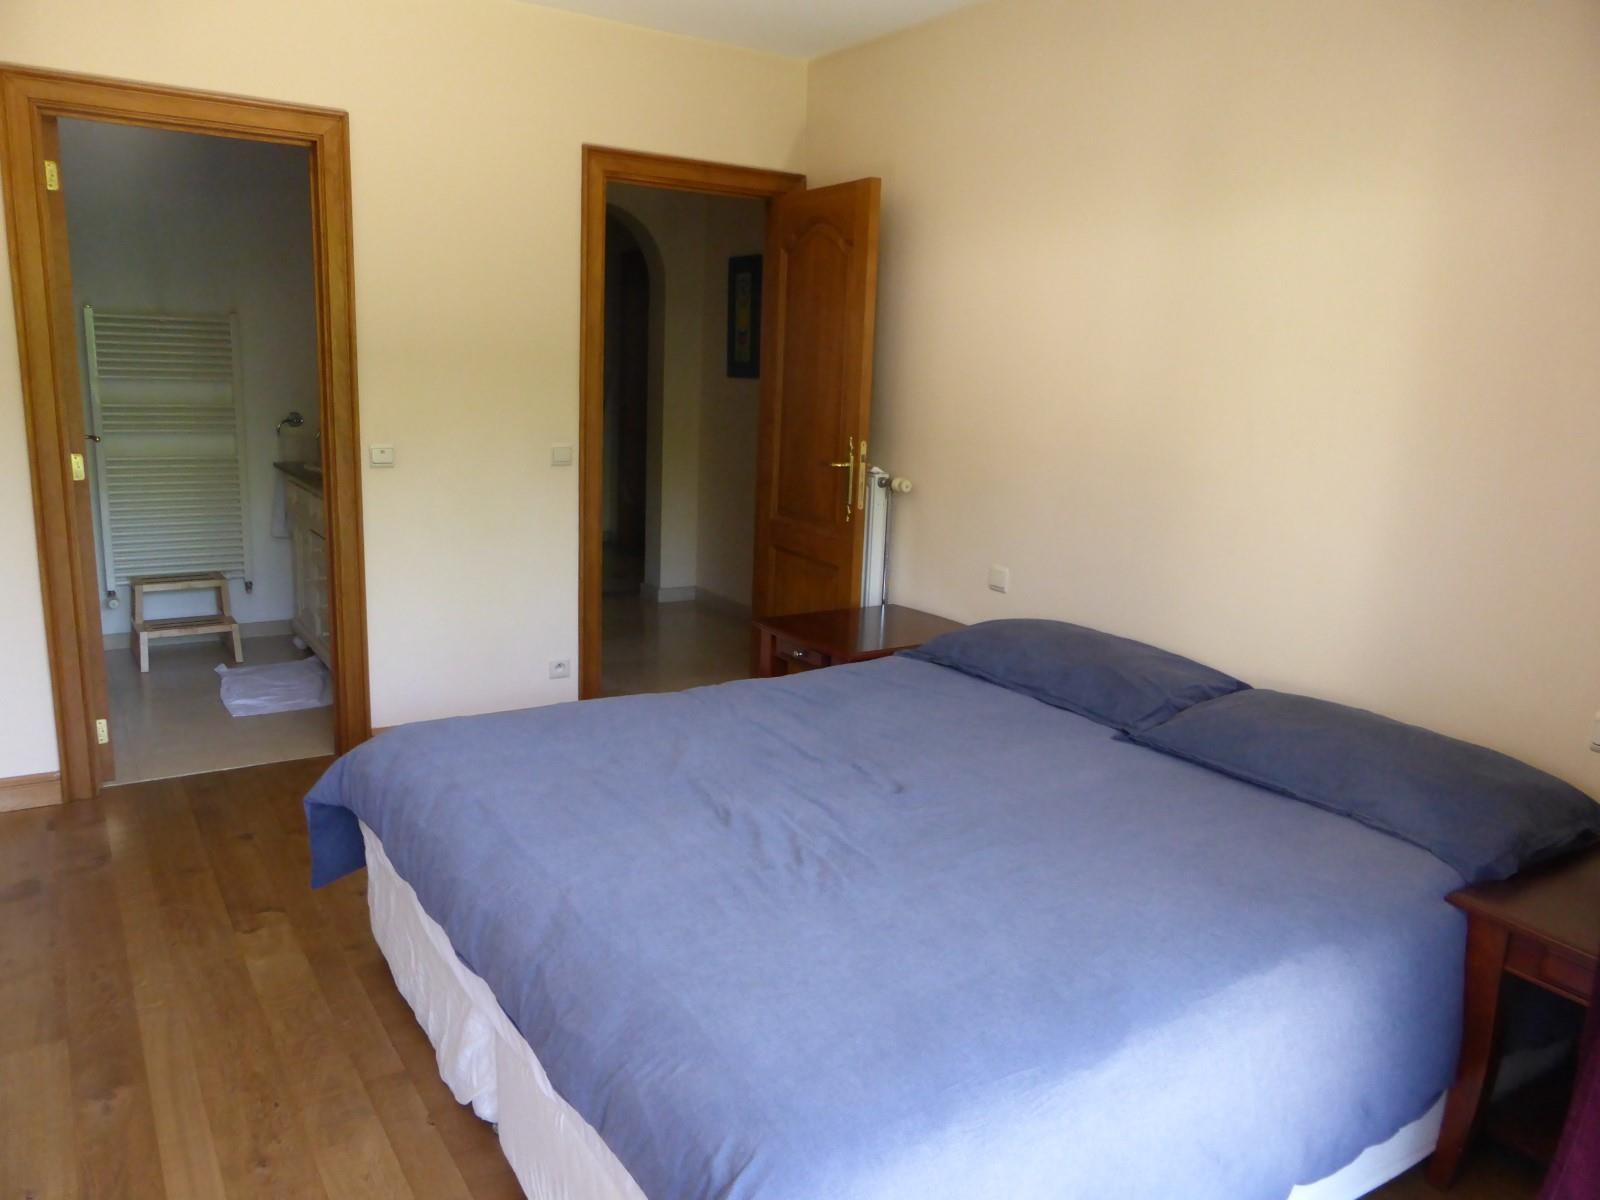 Appartement exceptionnel - Woluwe-Saint-Pierre - #2927607-5